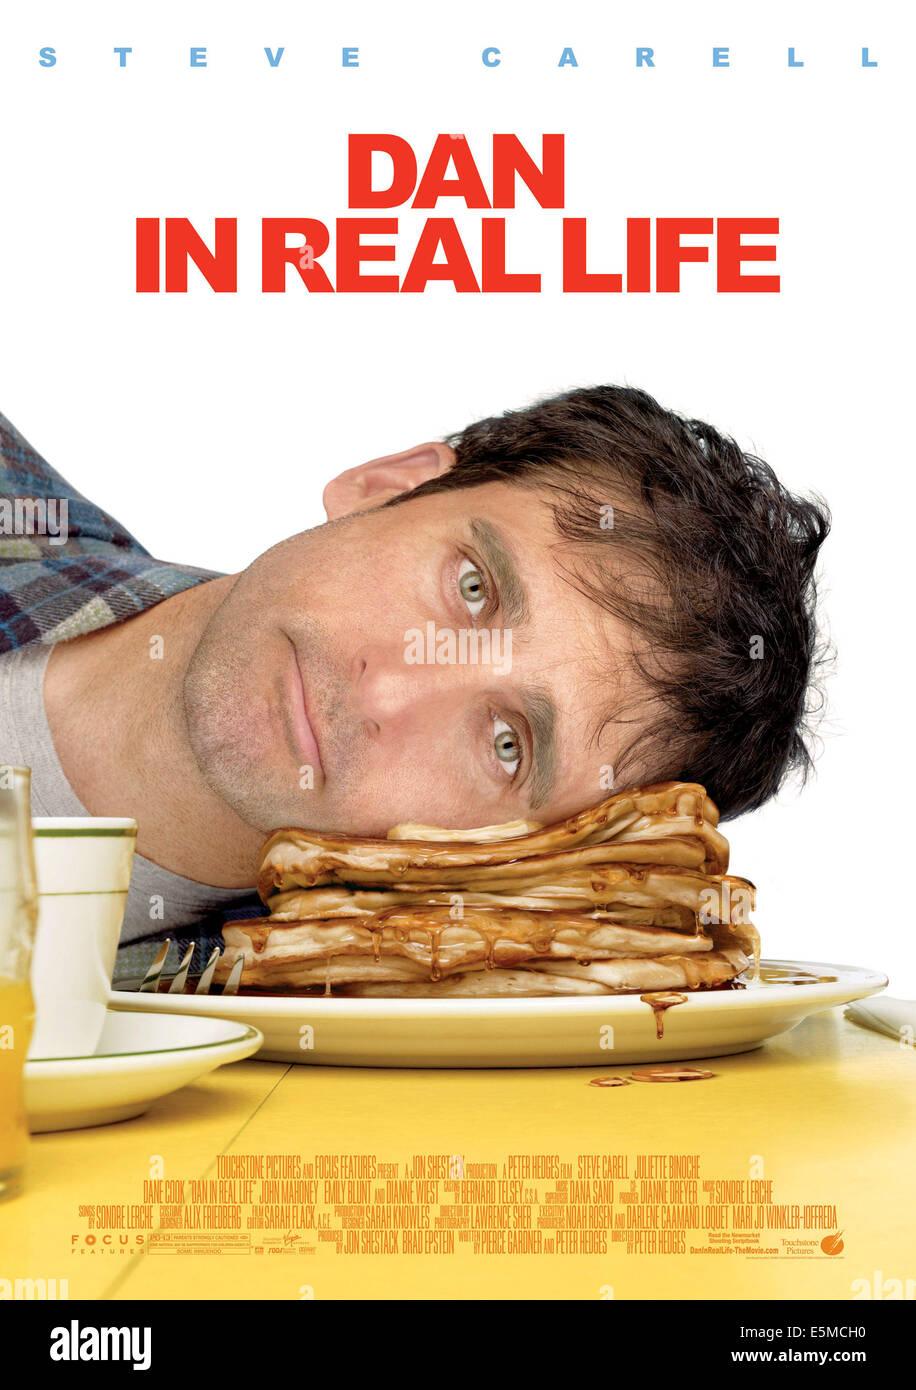 DAN IN REAL LIFE, Steve Carell, 2007, (c) Buena Vista/courtesy Everett Collection - Stock Image